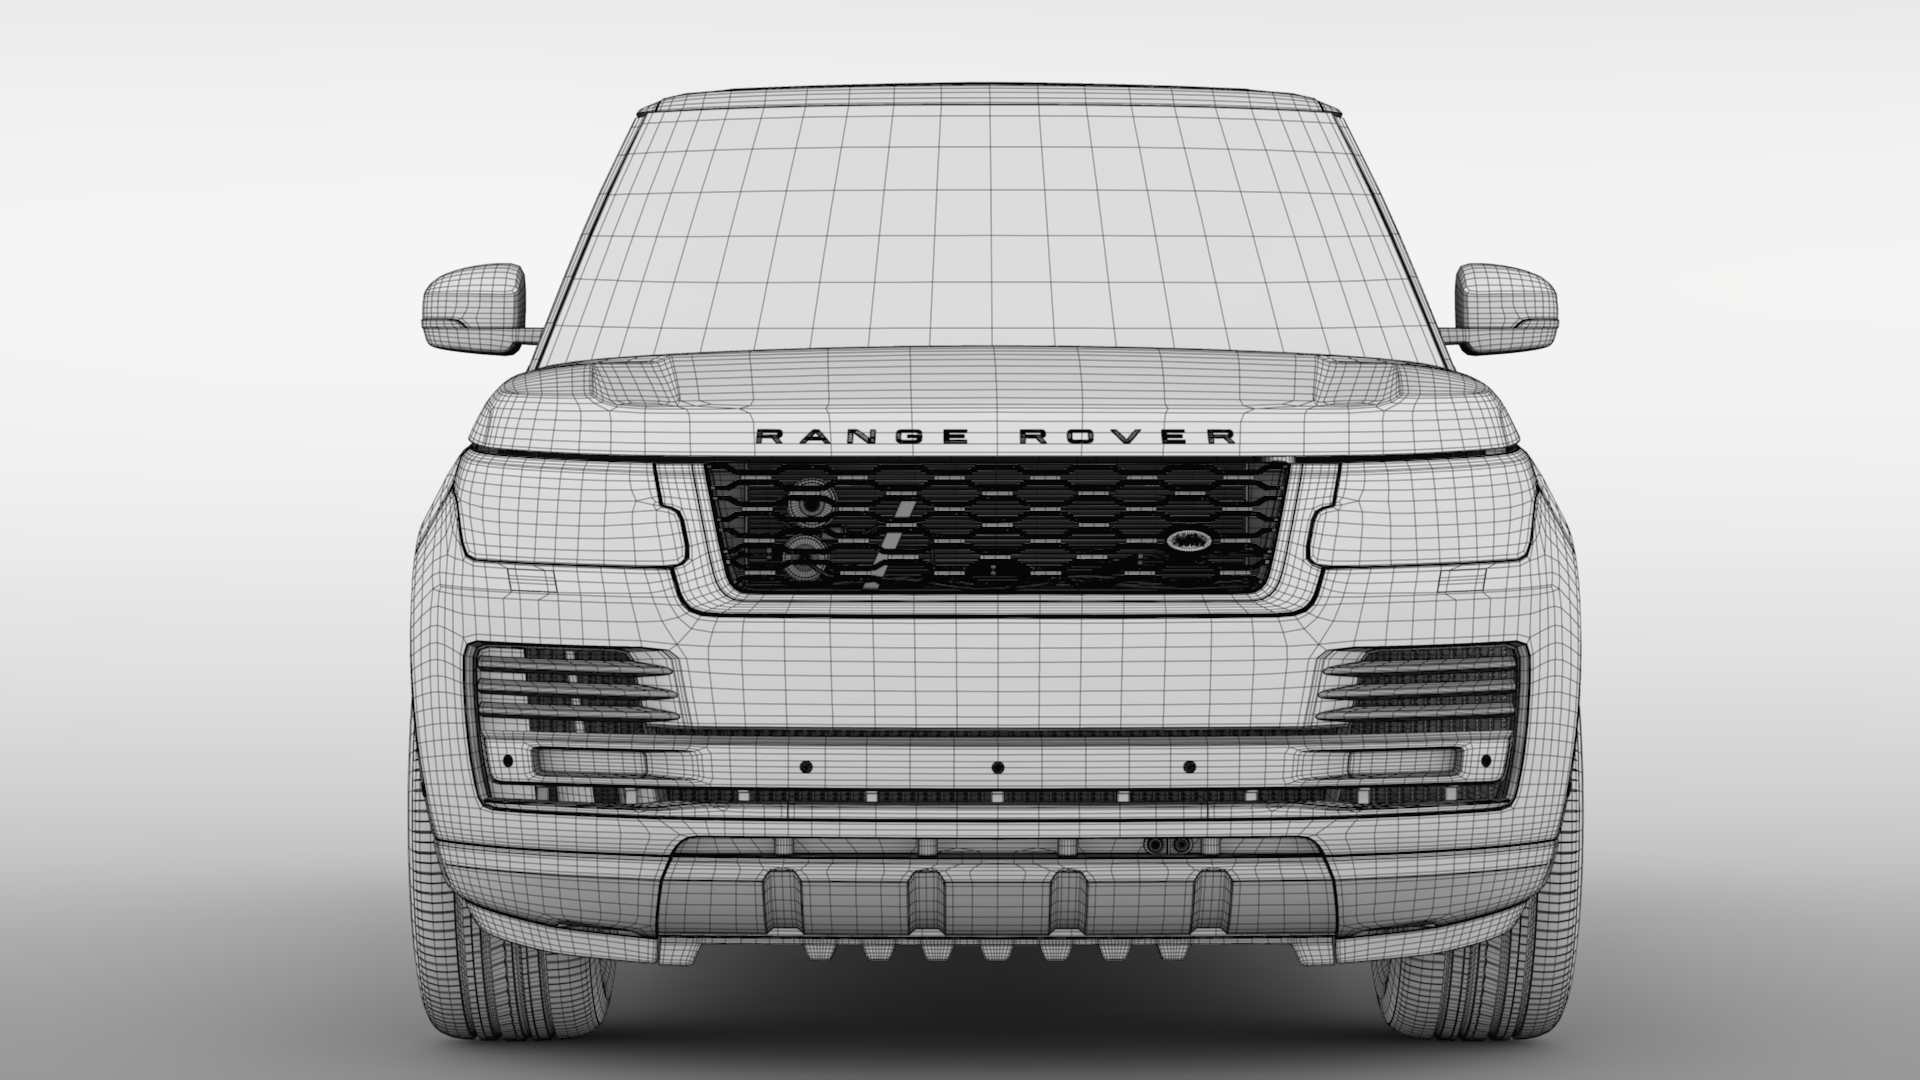 range rover autobiography hybrid lwb l405 2018 3d model max fbx c4d lwo ma mb hrc xsi obj 277311